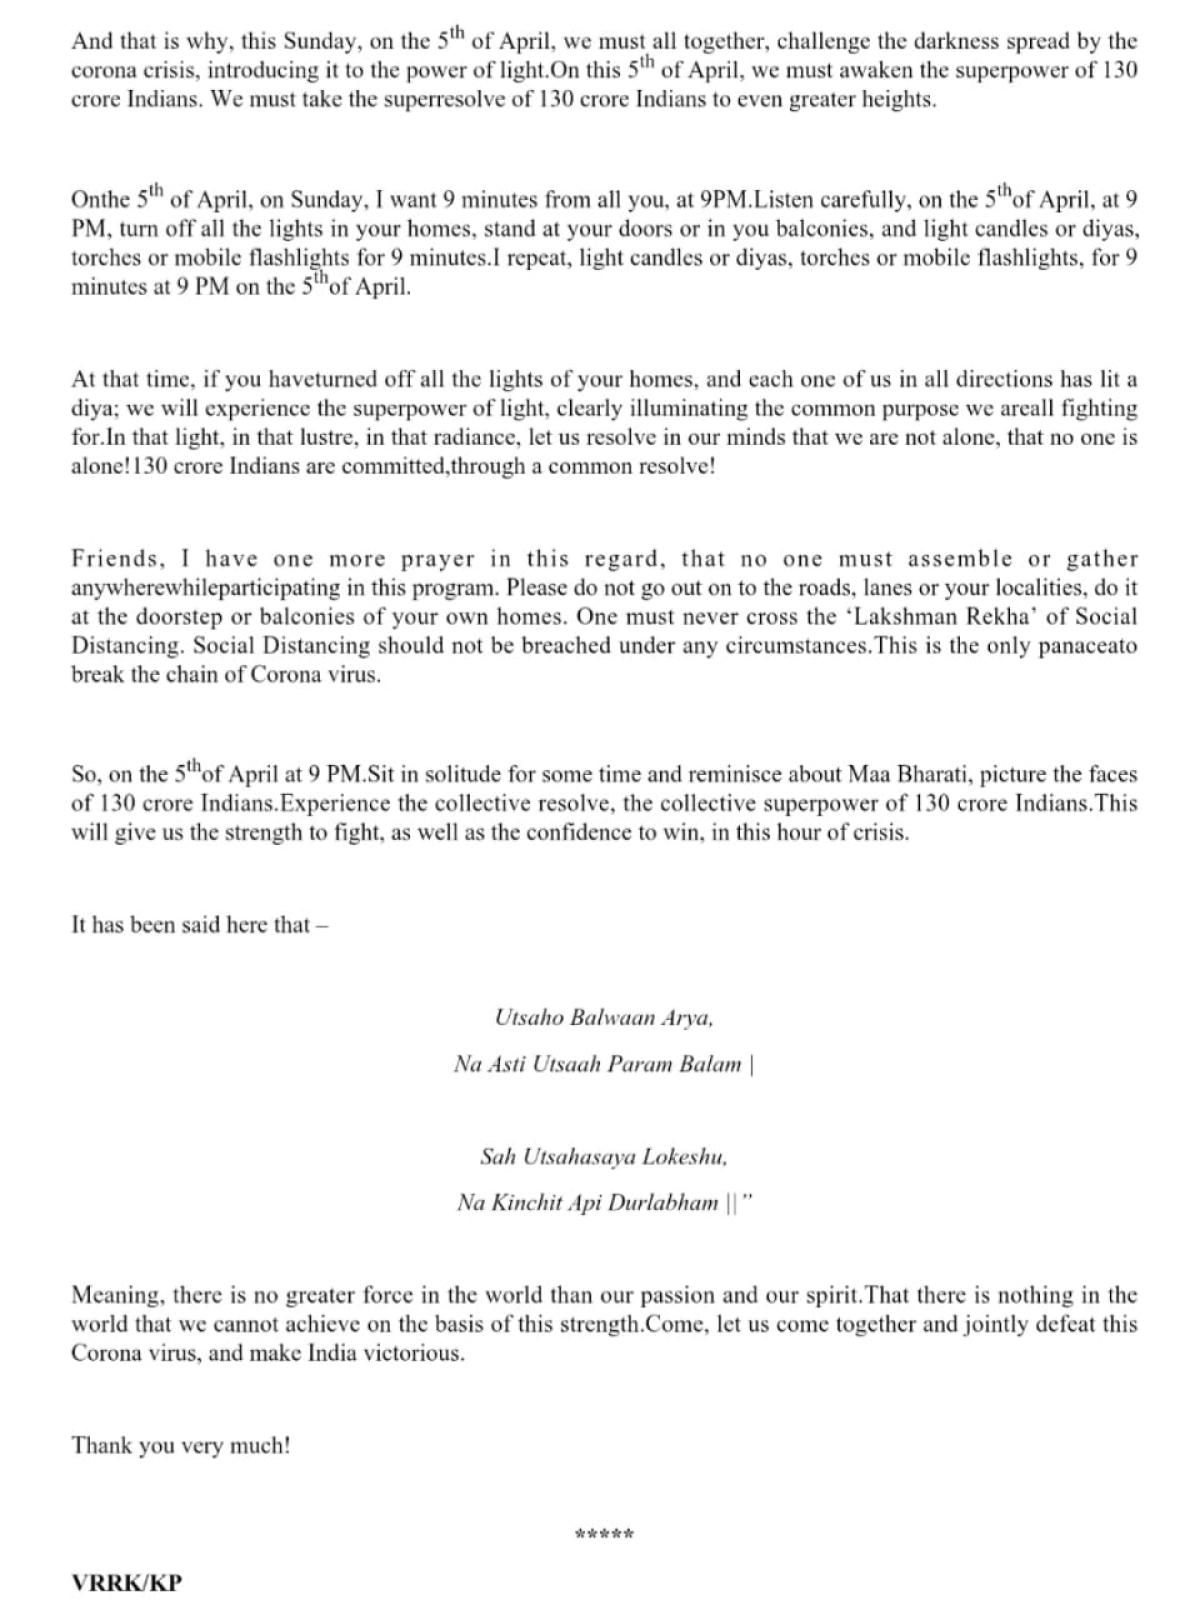 Full text of PM Narendra Modi's 9 am speech on April 3, 2020